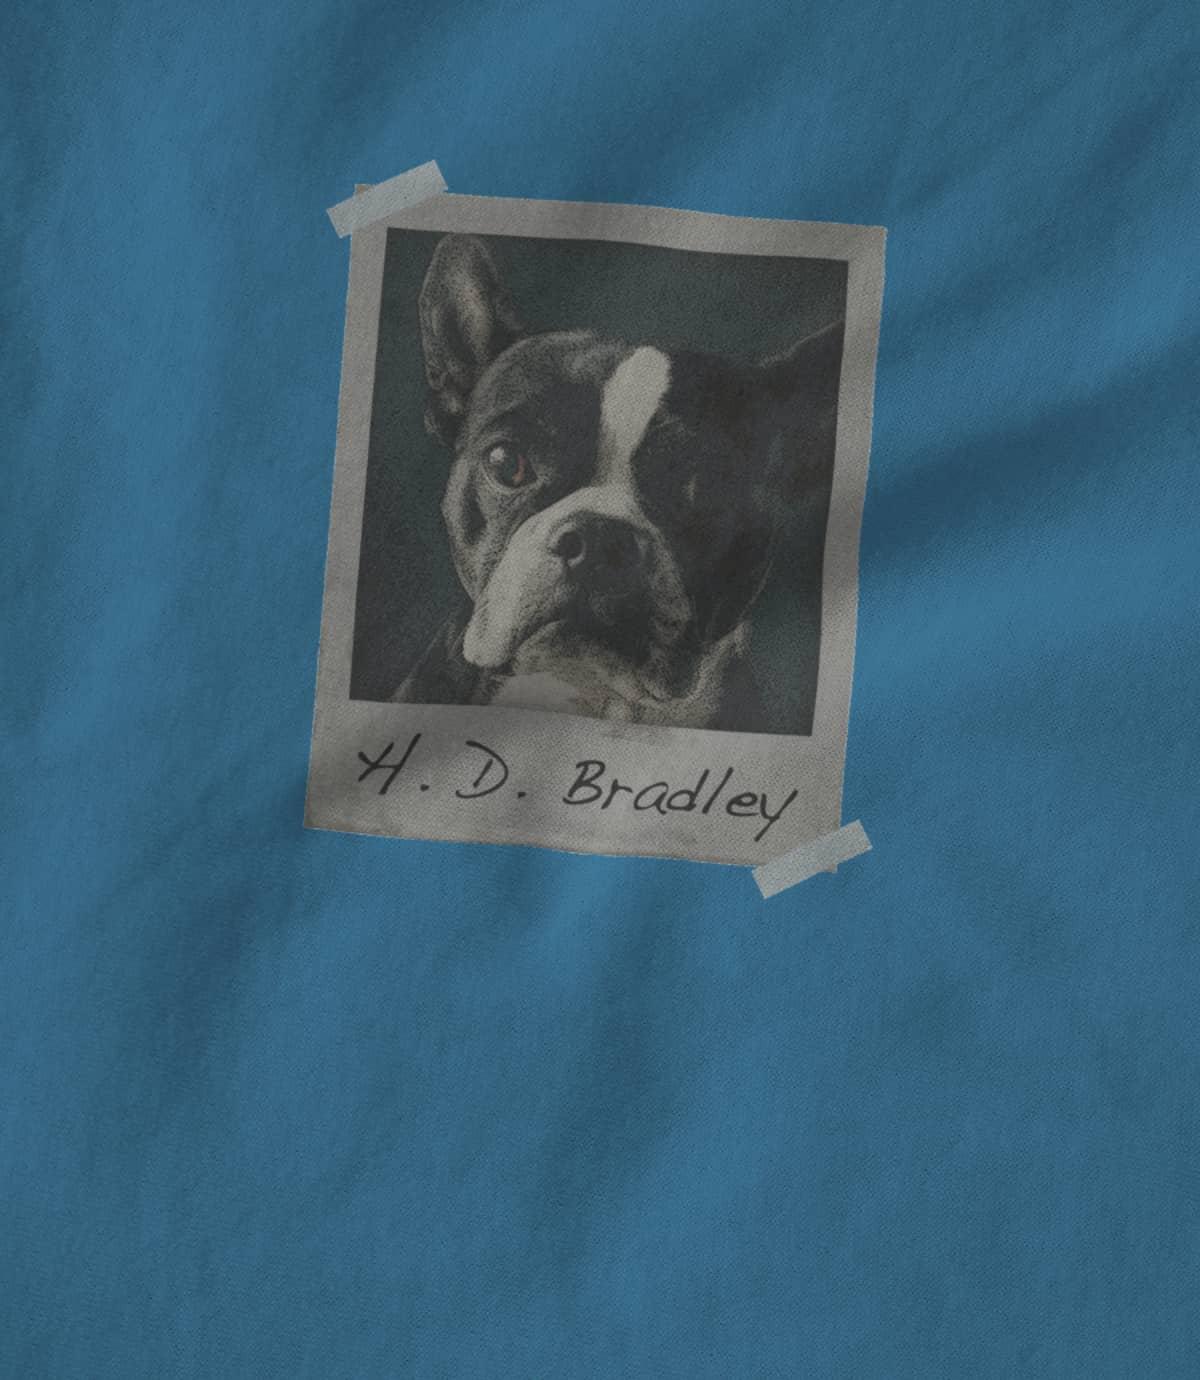 HD Bradley